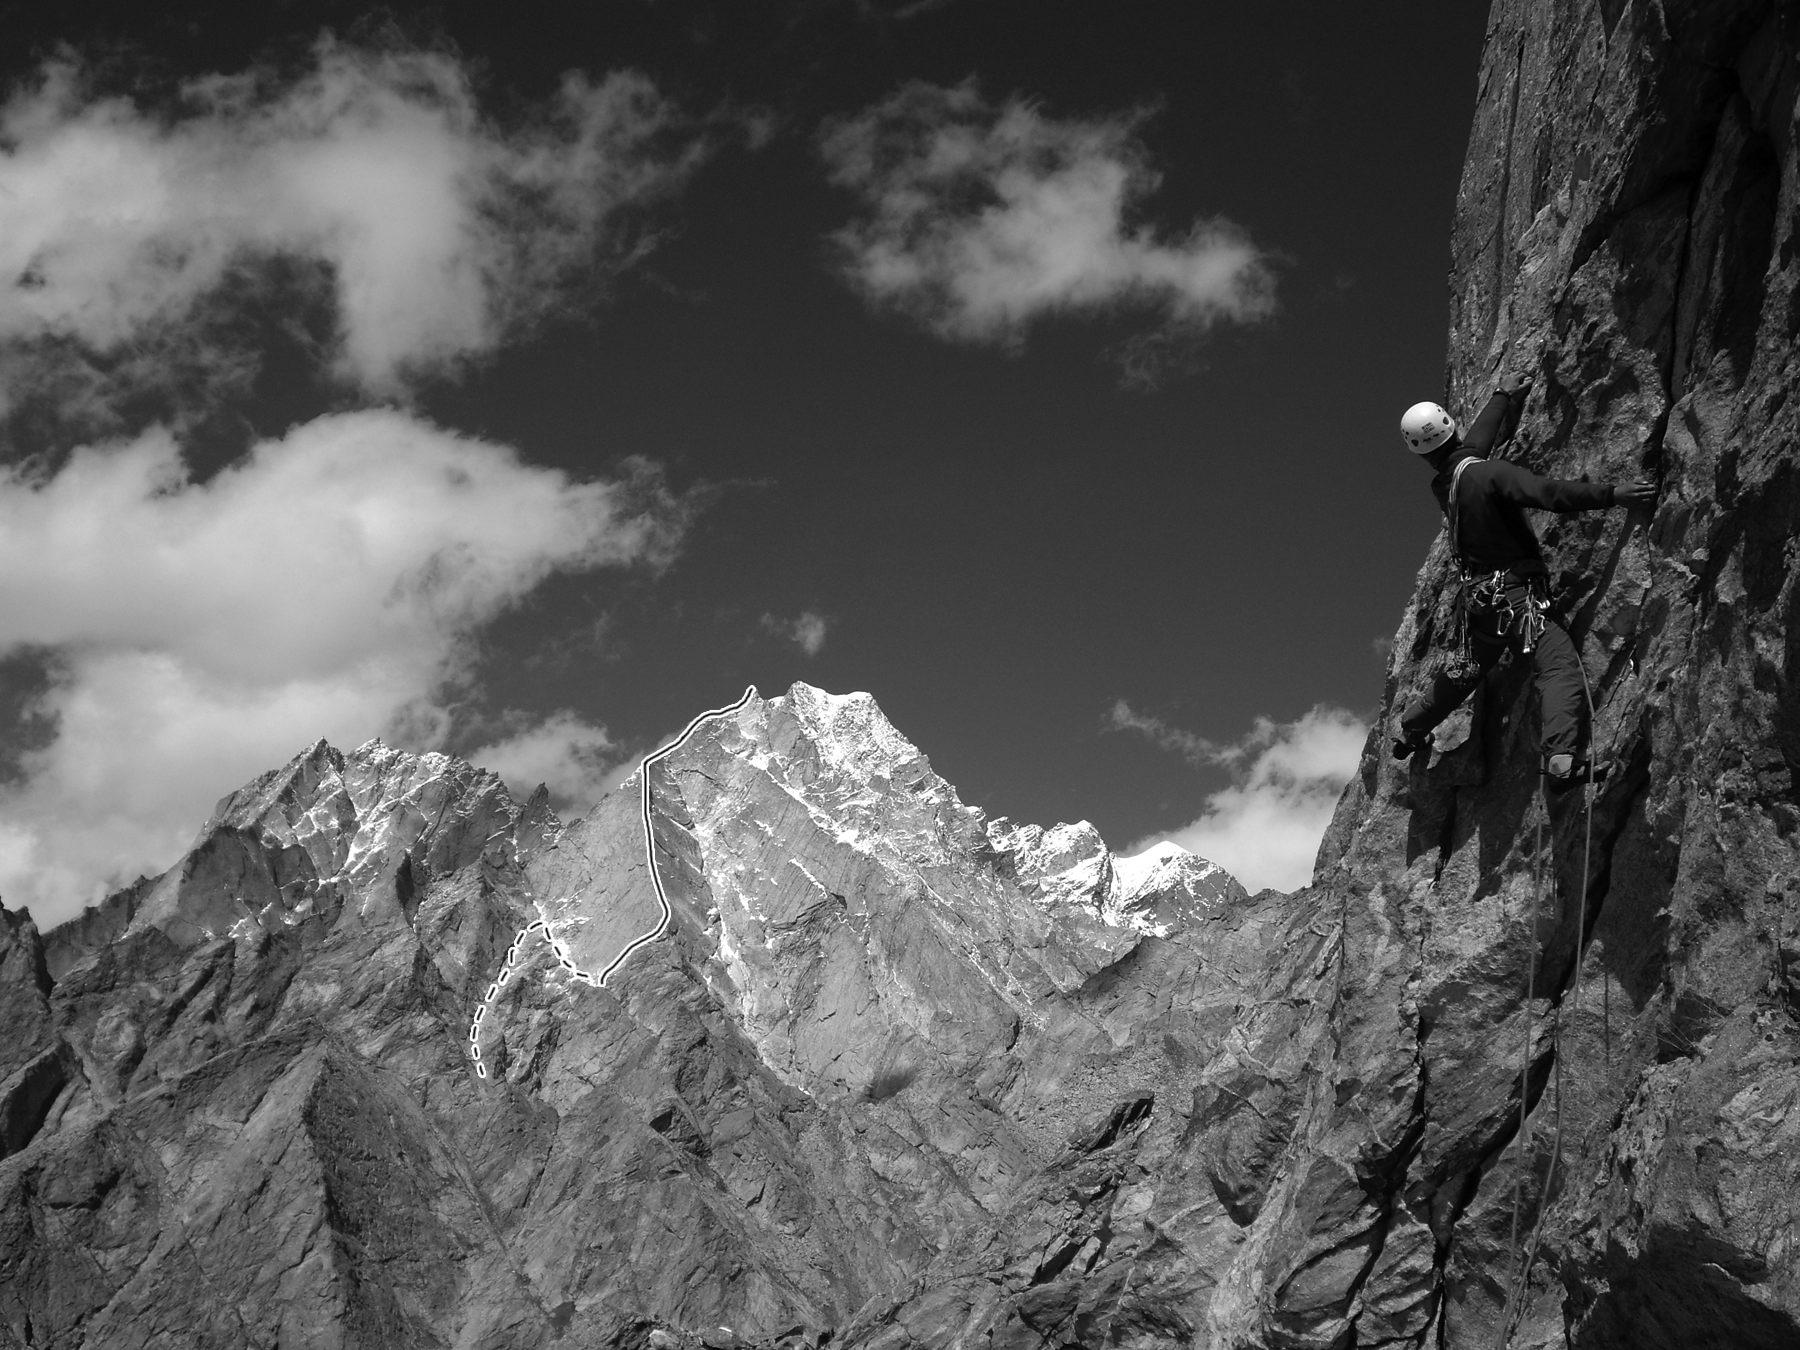 Andrej Gmorsek on Loofolam, with Korklum Gou–Window Peak (ca 5,600m) in the background, showing the 600m-vertical Shangrila Ridge route. Tanja Grmorvsek